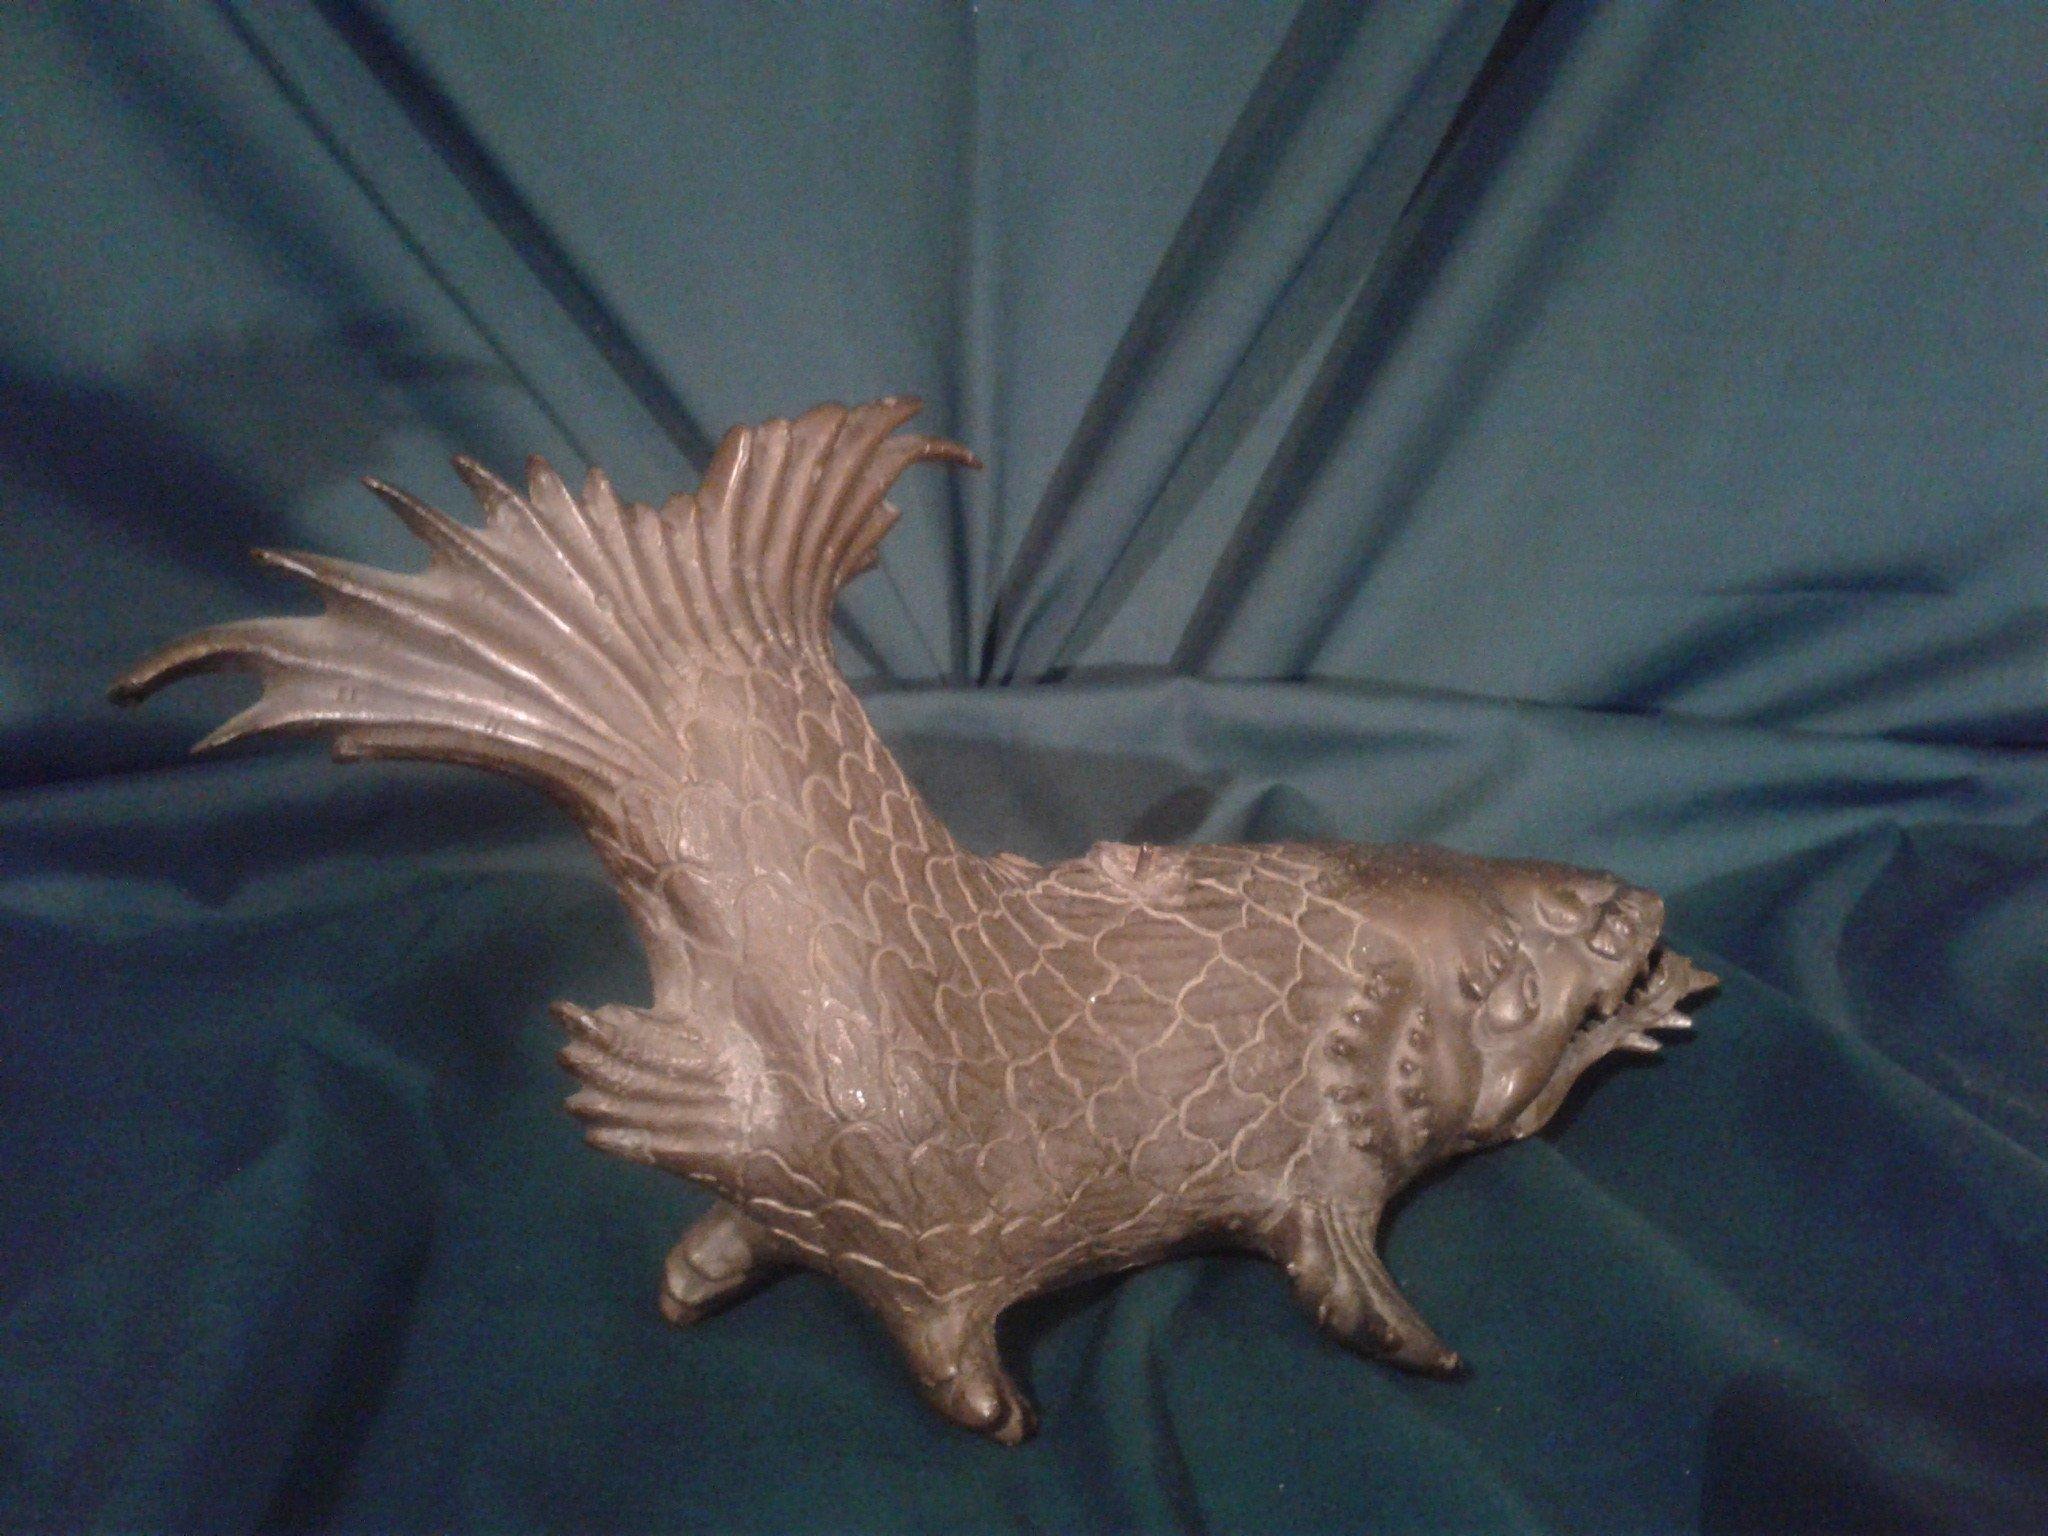 Antique Chinese bronze catfish